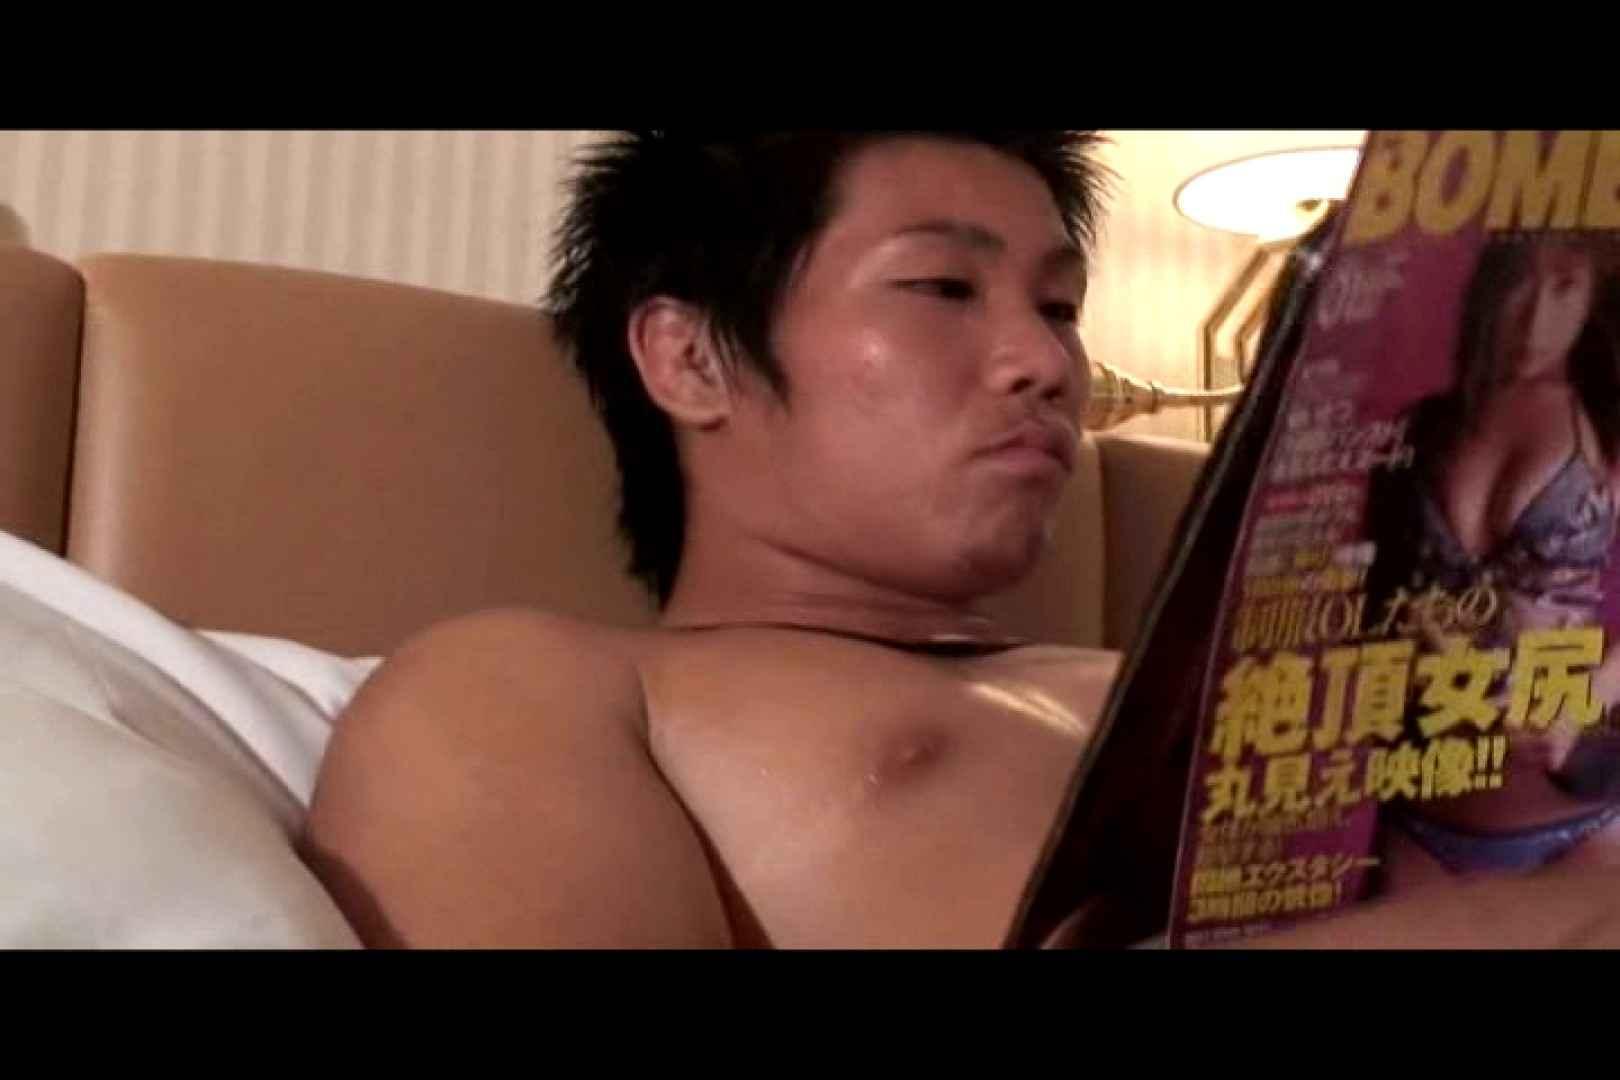 Bistro「イケメン」~Mokkori和風仕立て~vol.03 オナニー専門男子 ゲイ丸見え画像 67画像 50